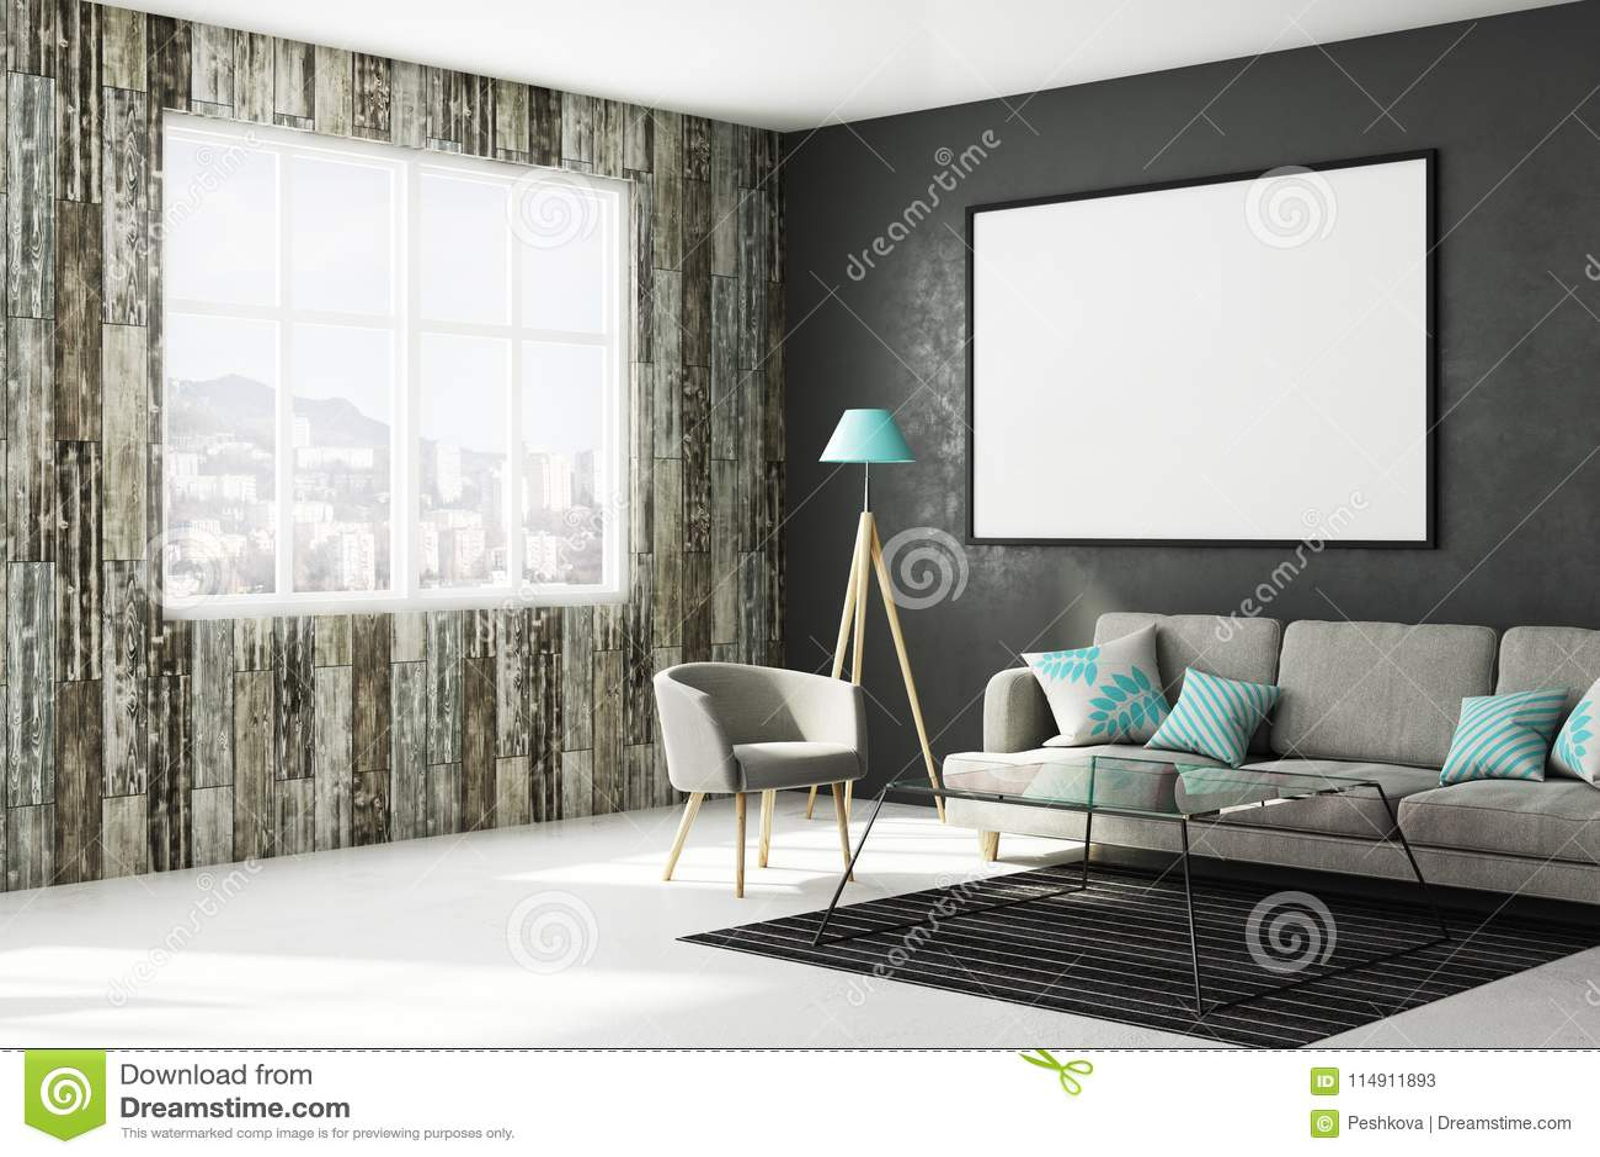 Living Room Banner Images